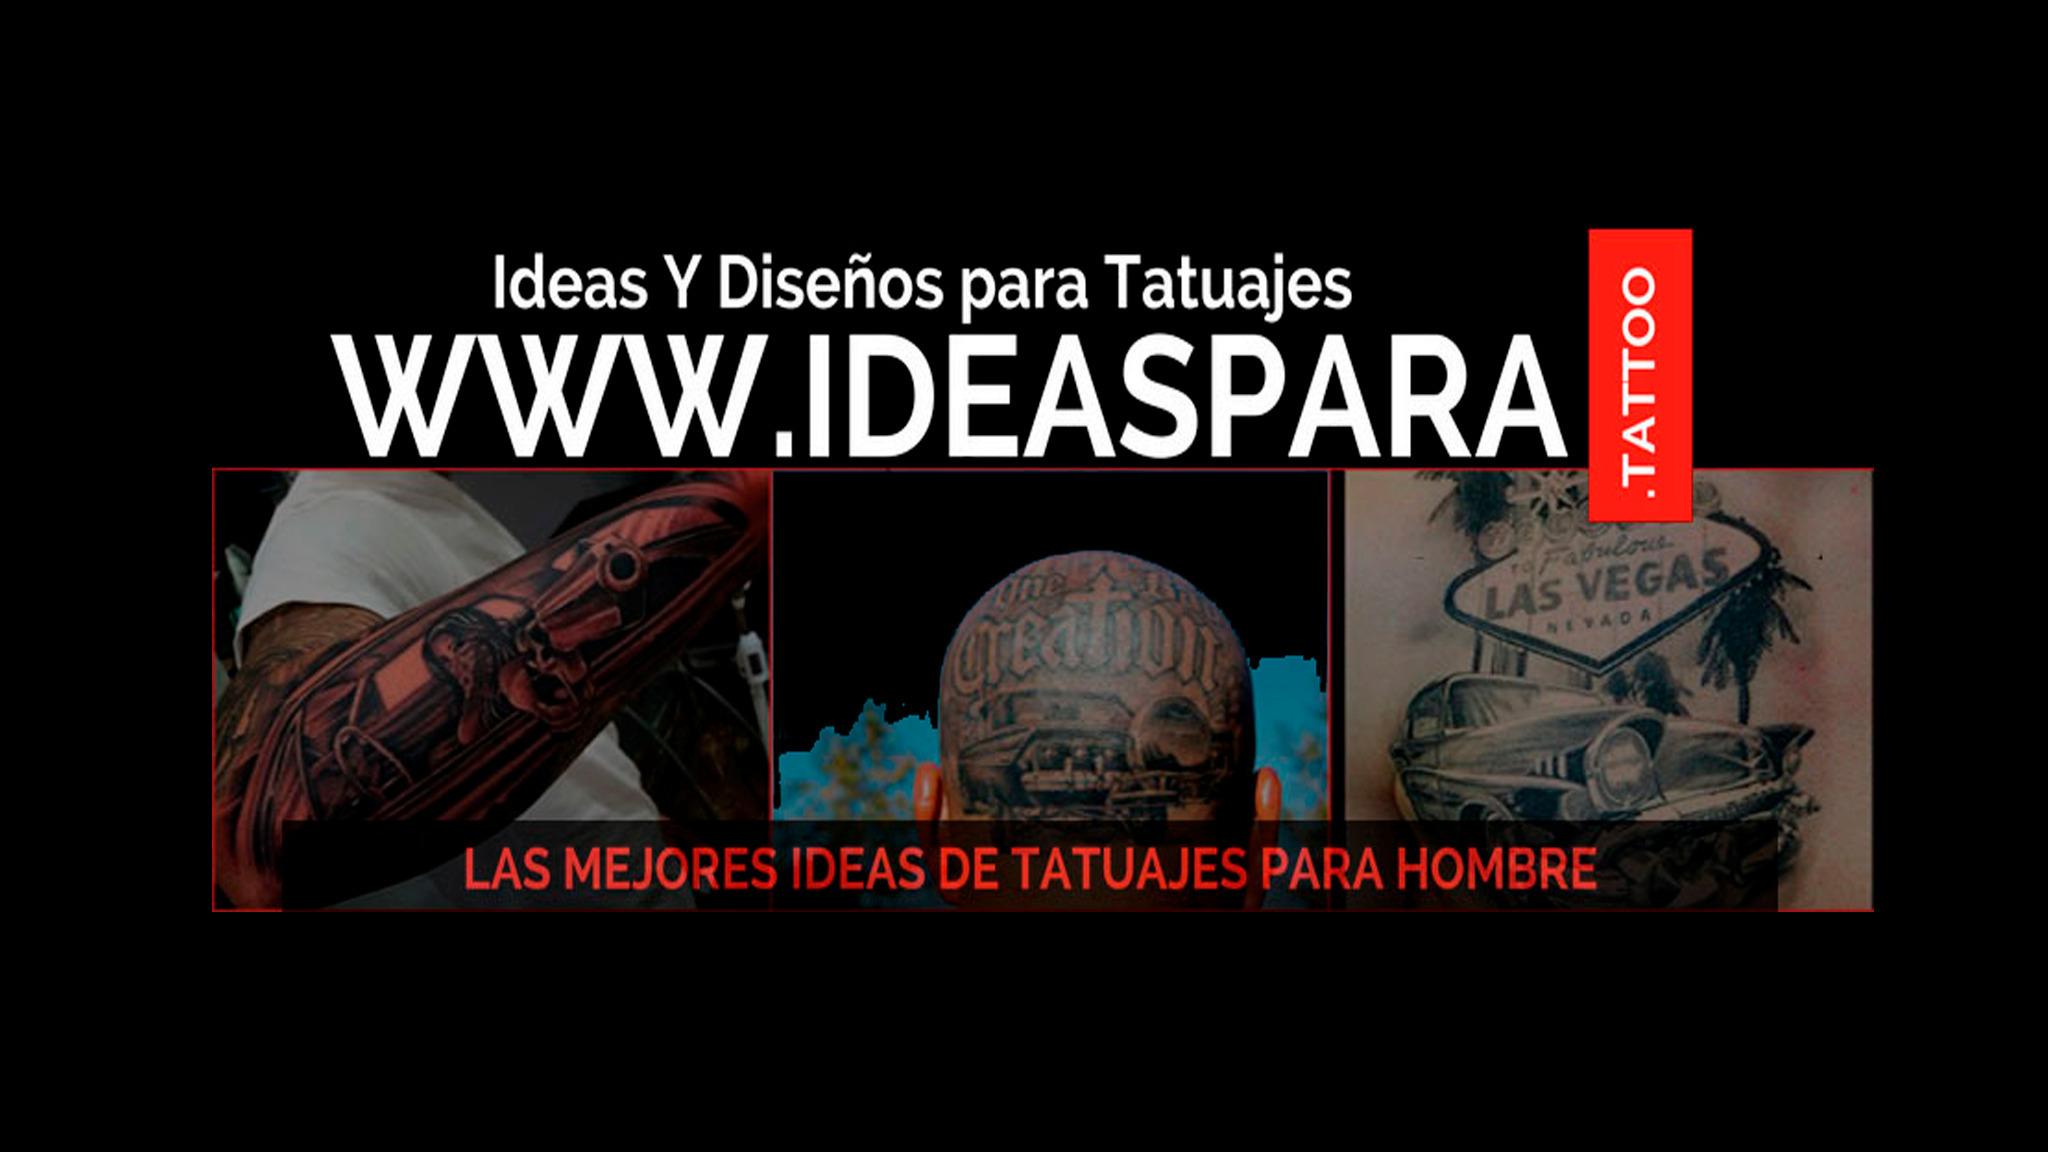 ideas para tatuajes de hombre (@ideasparatattoo) Cover Image